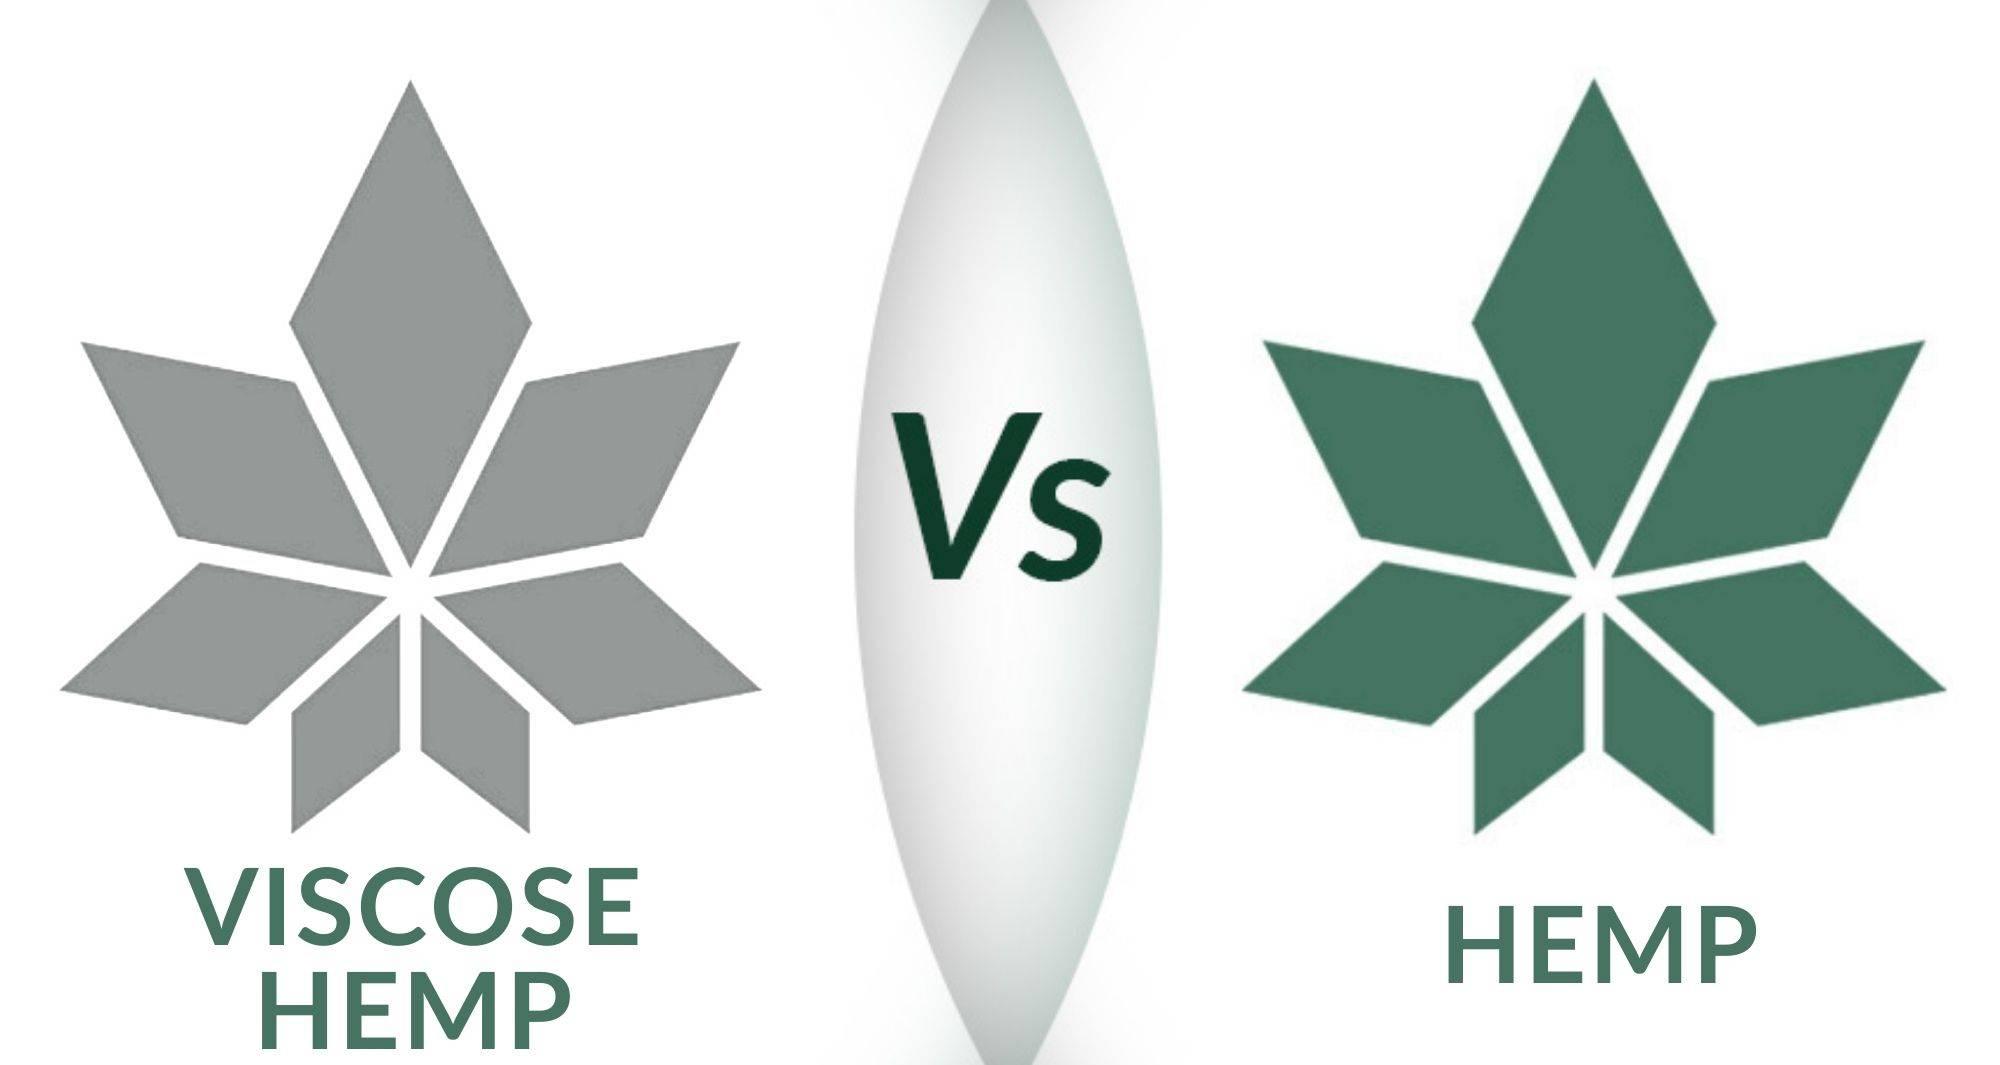 Viscose Hemp Vs Hemp image by WAMA Underwear